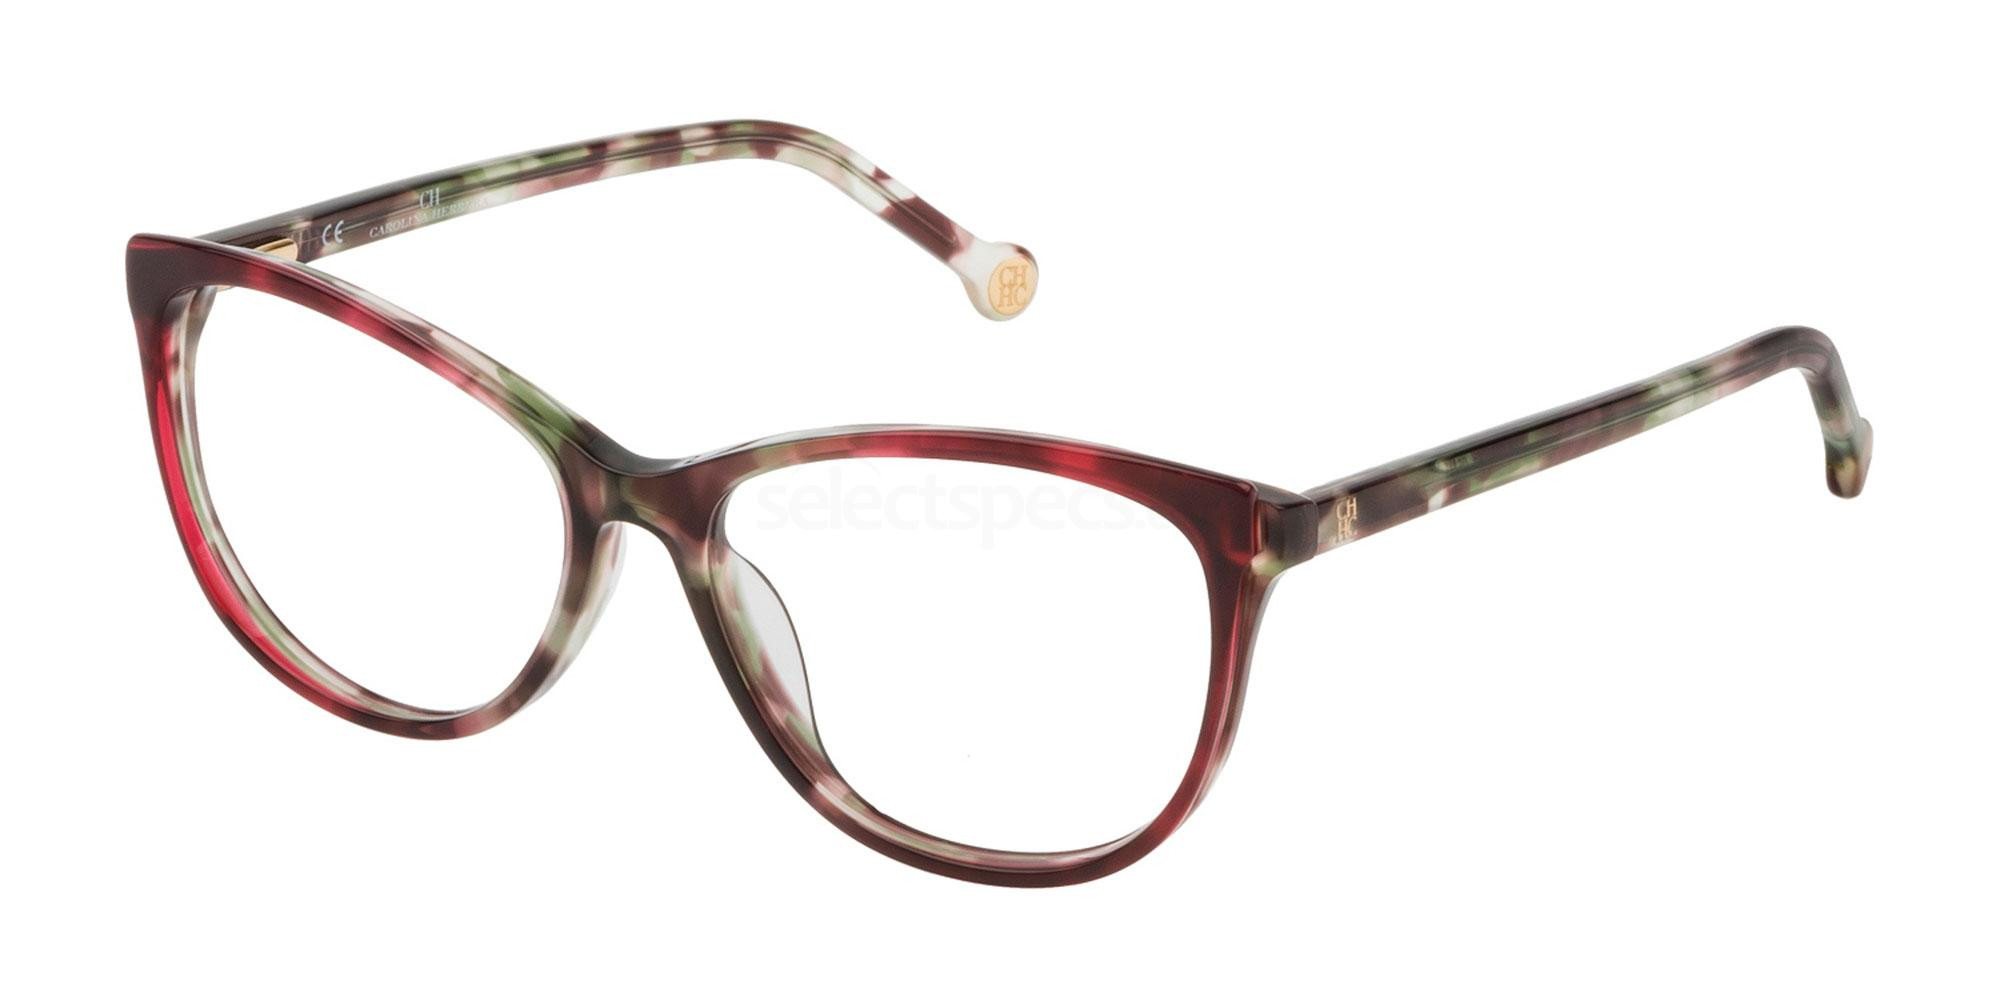 05AH VHE804 Glasses, CH Carolina Herrera